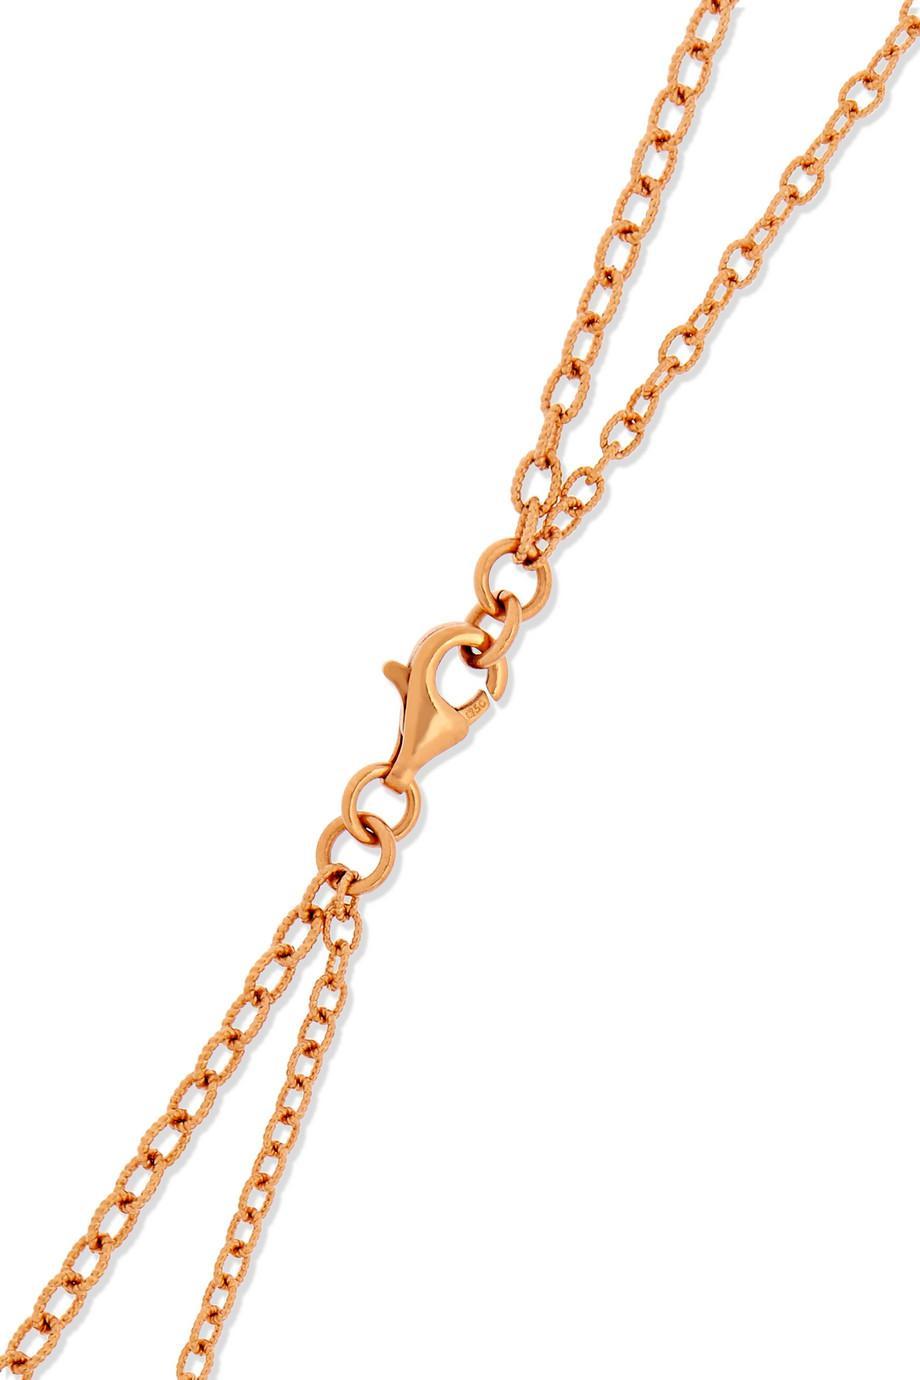 Carolina Bucci Matchstick 18-karat Rose Gold Necklace yk4W5F